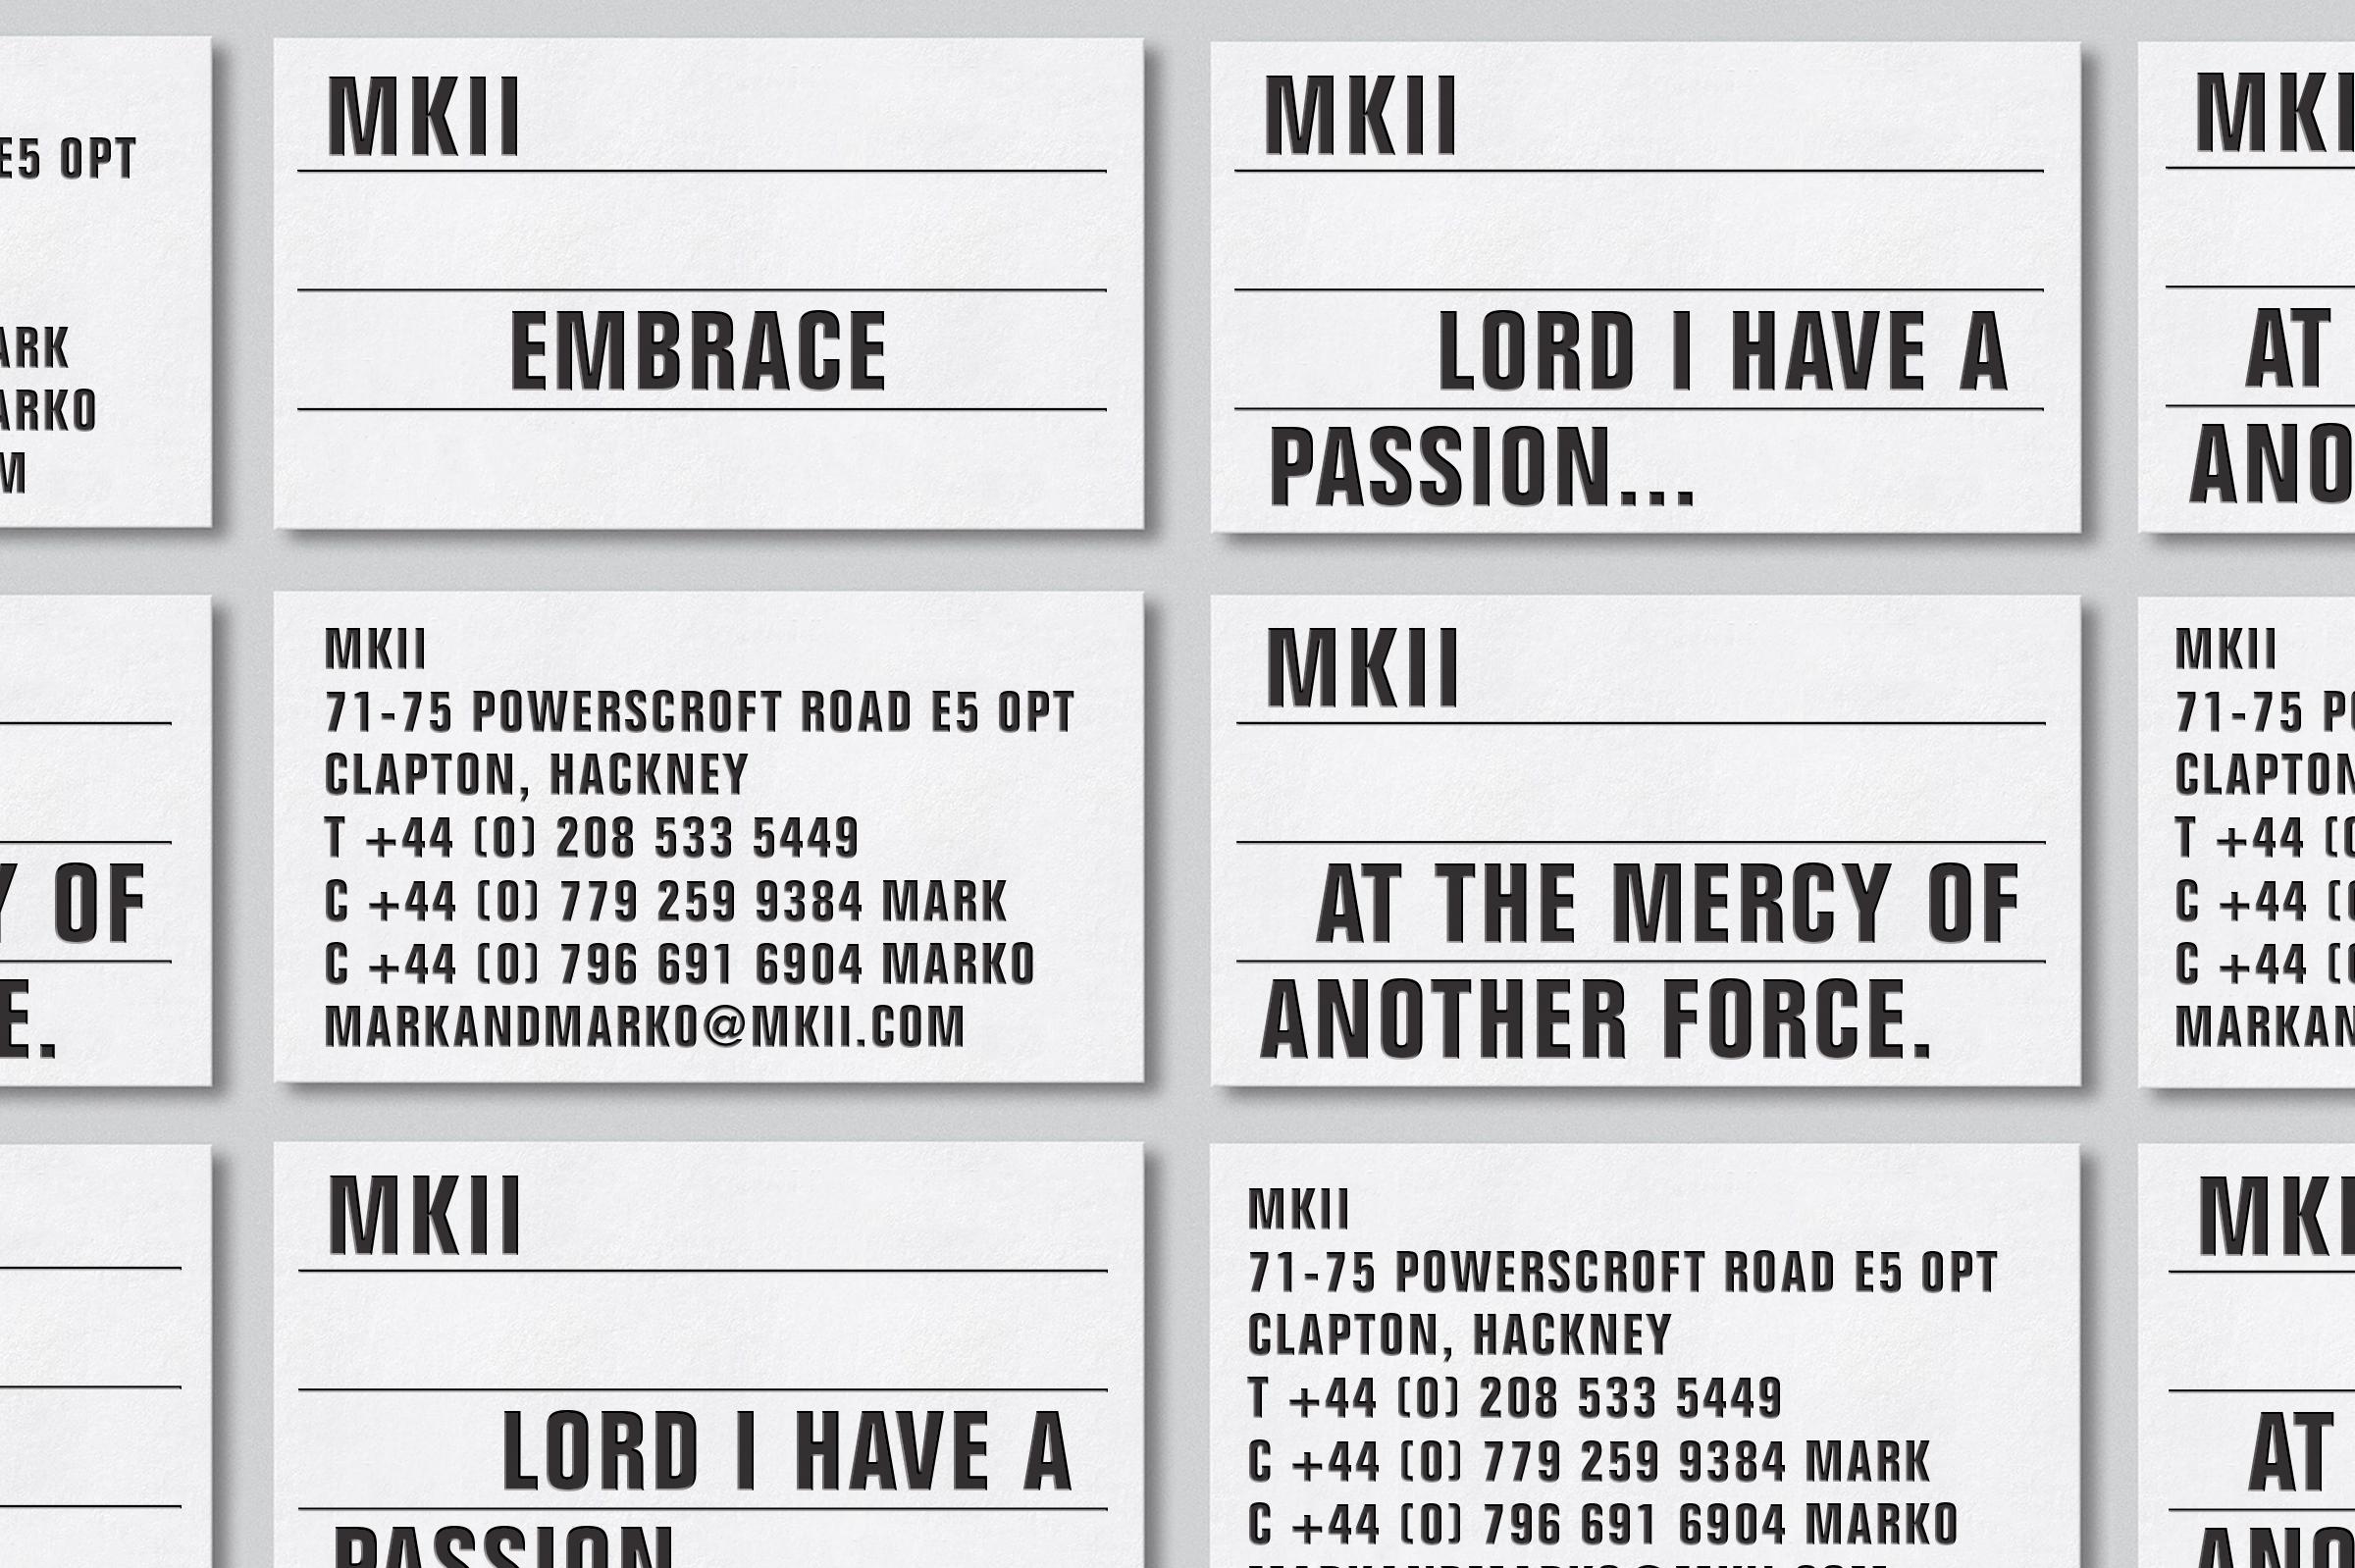 mkll_identity_07